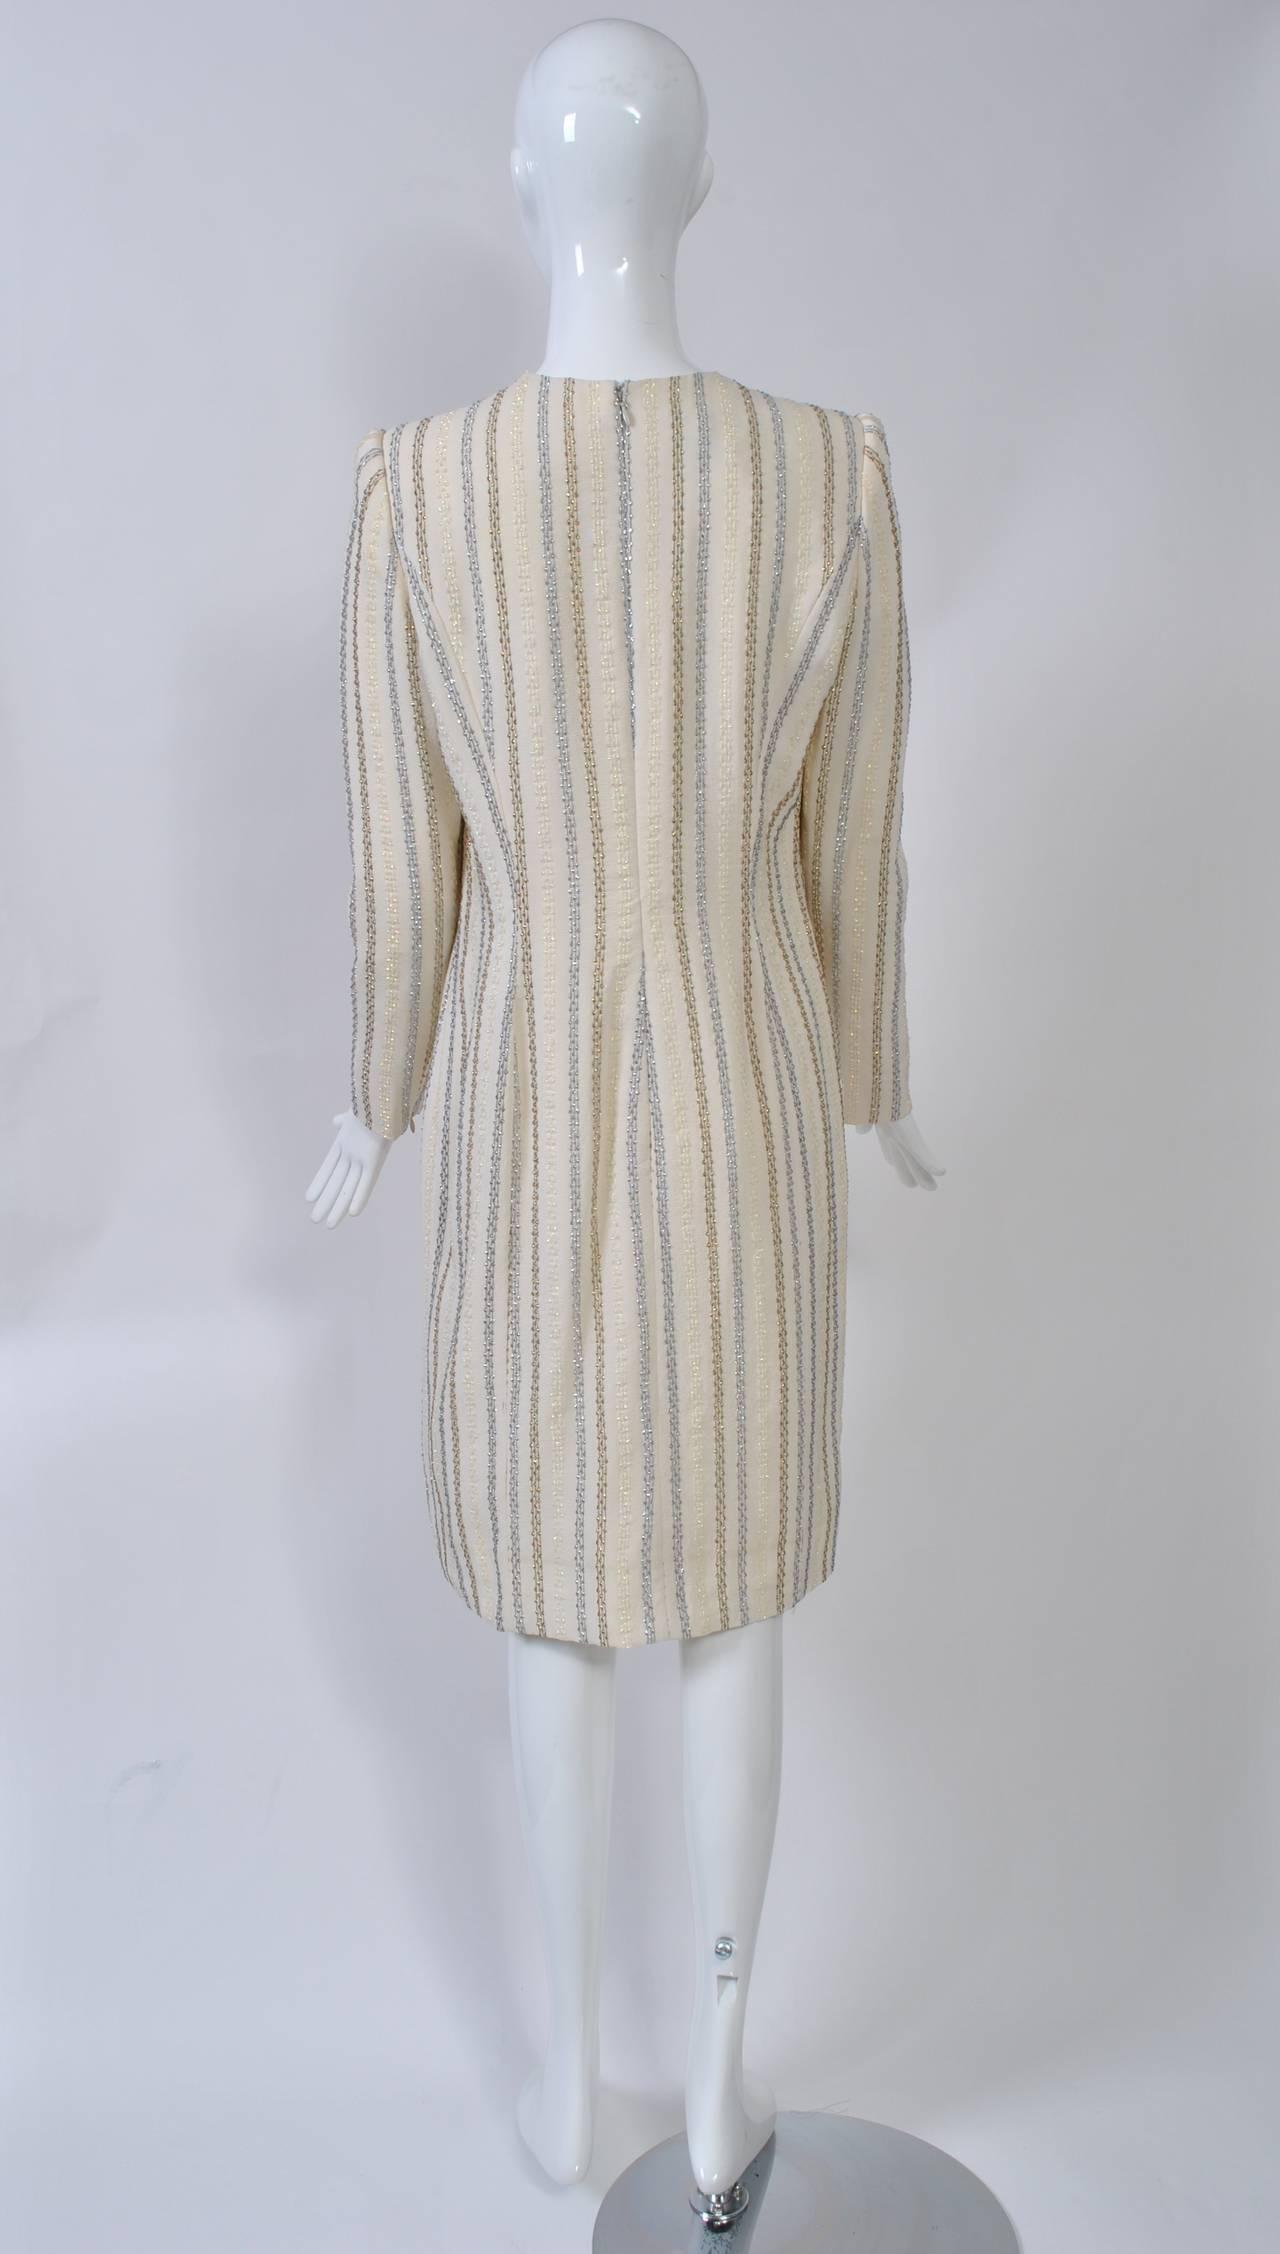 Carolina Herrera Ivory and Metallic Dress 4